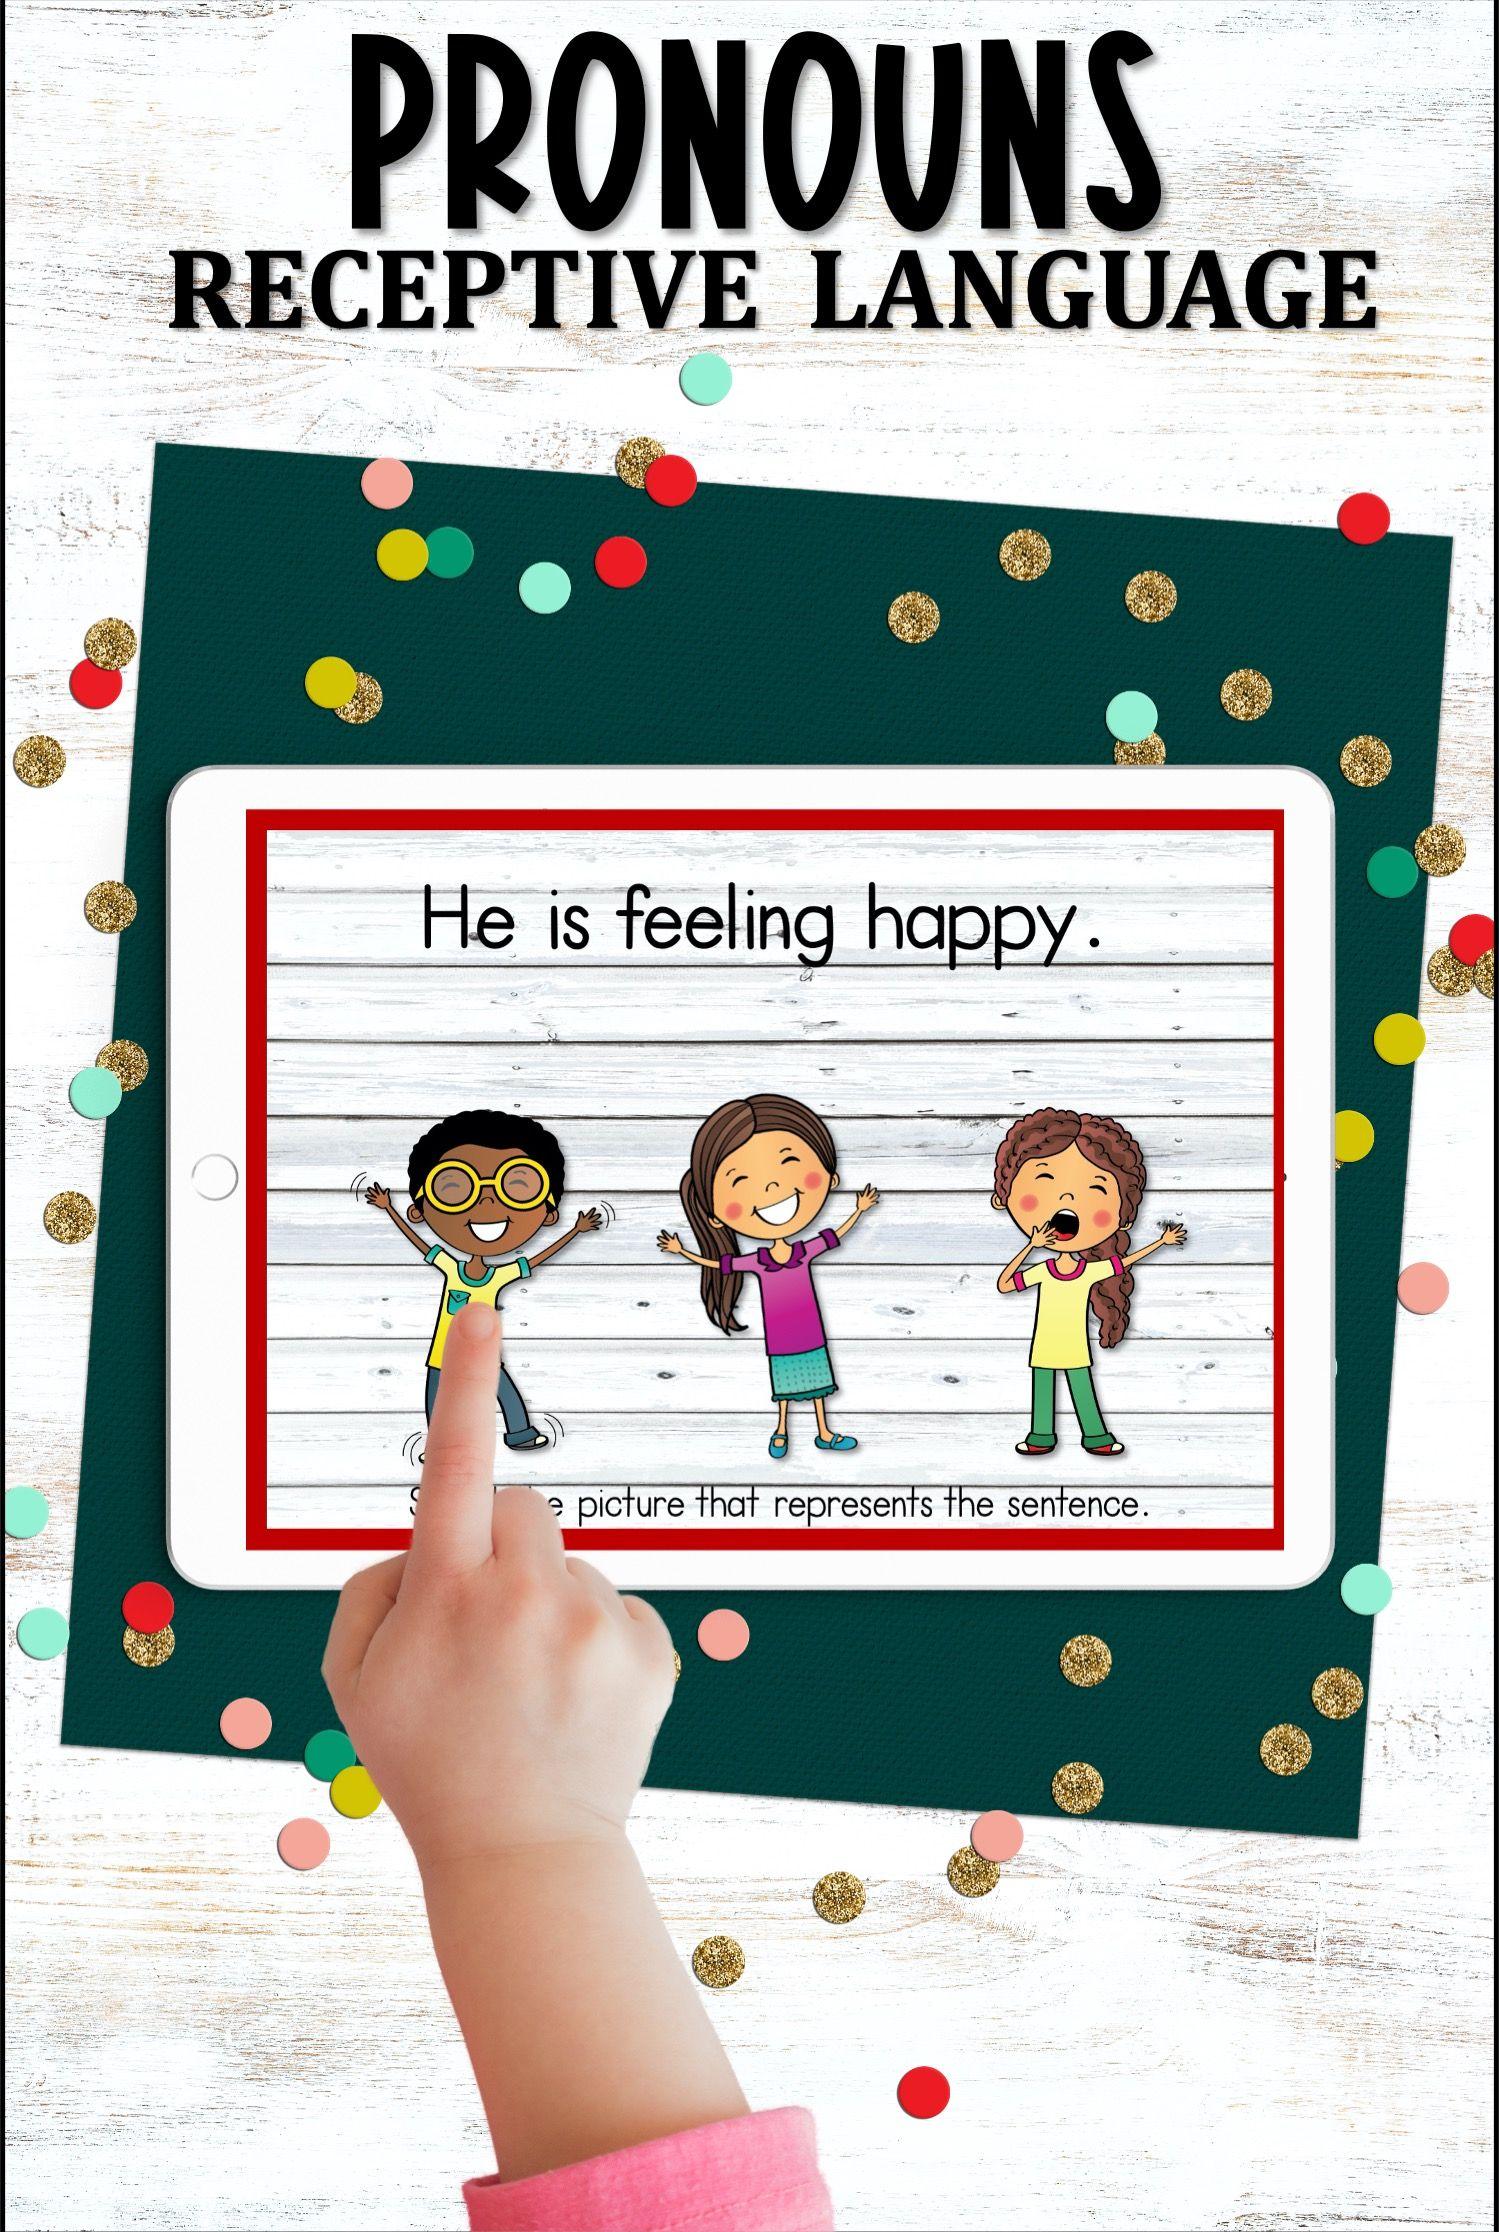 Receptive Language Pronouns Receptive Language Activities Expressive Language Activities Speech Therapy Activities Preschool